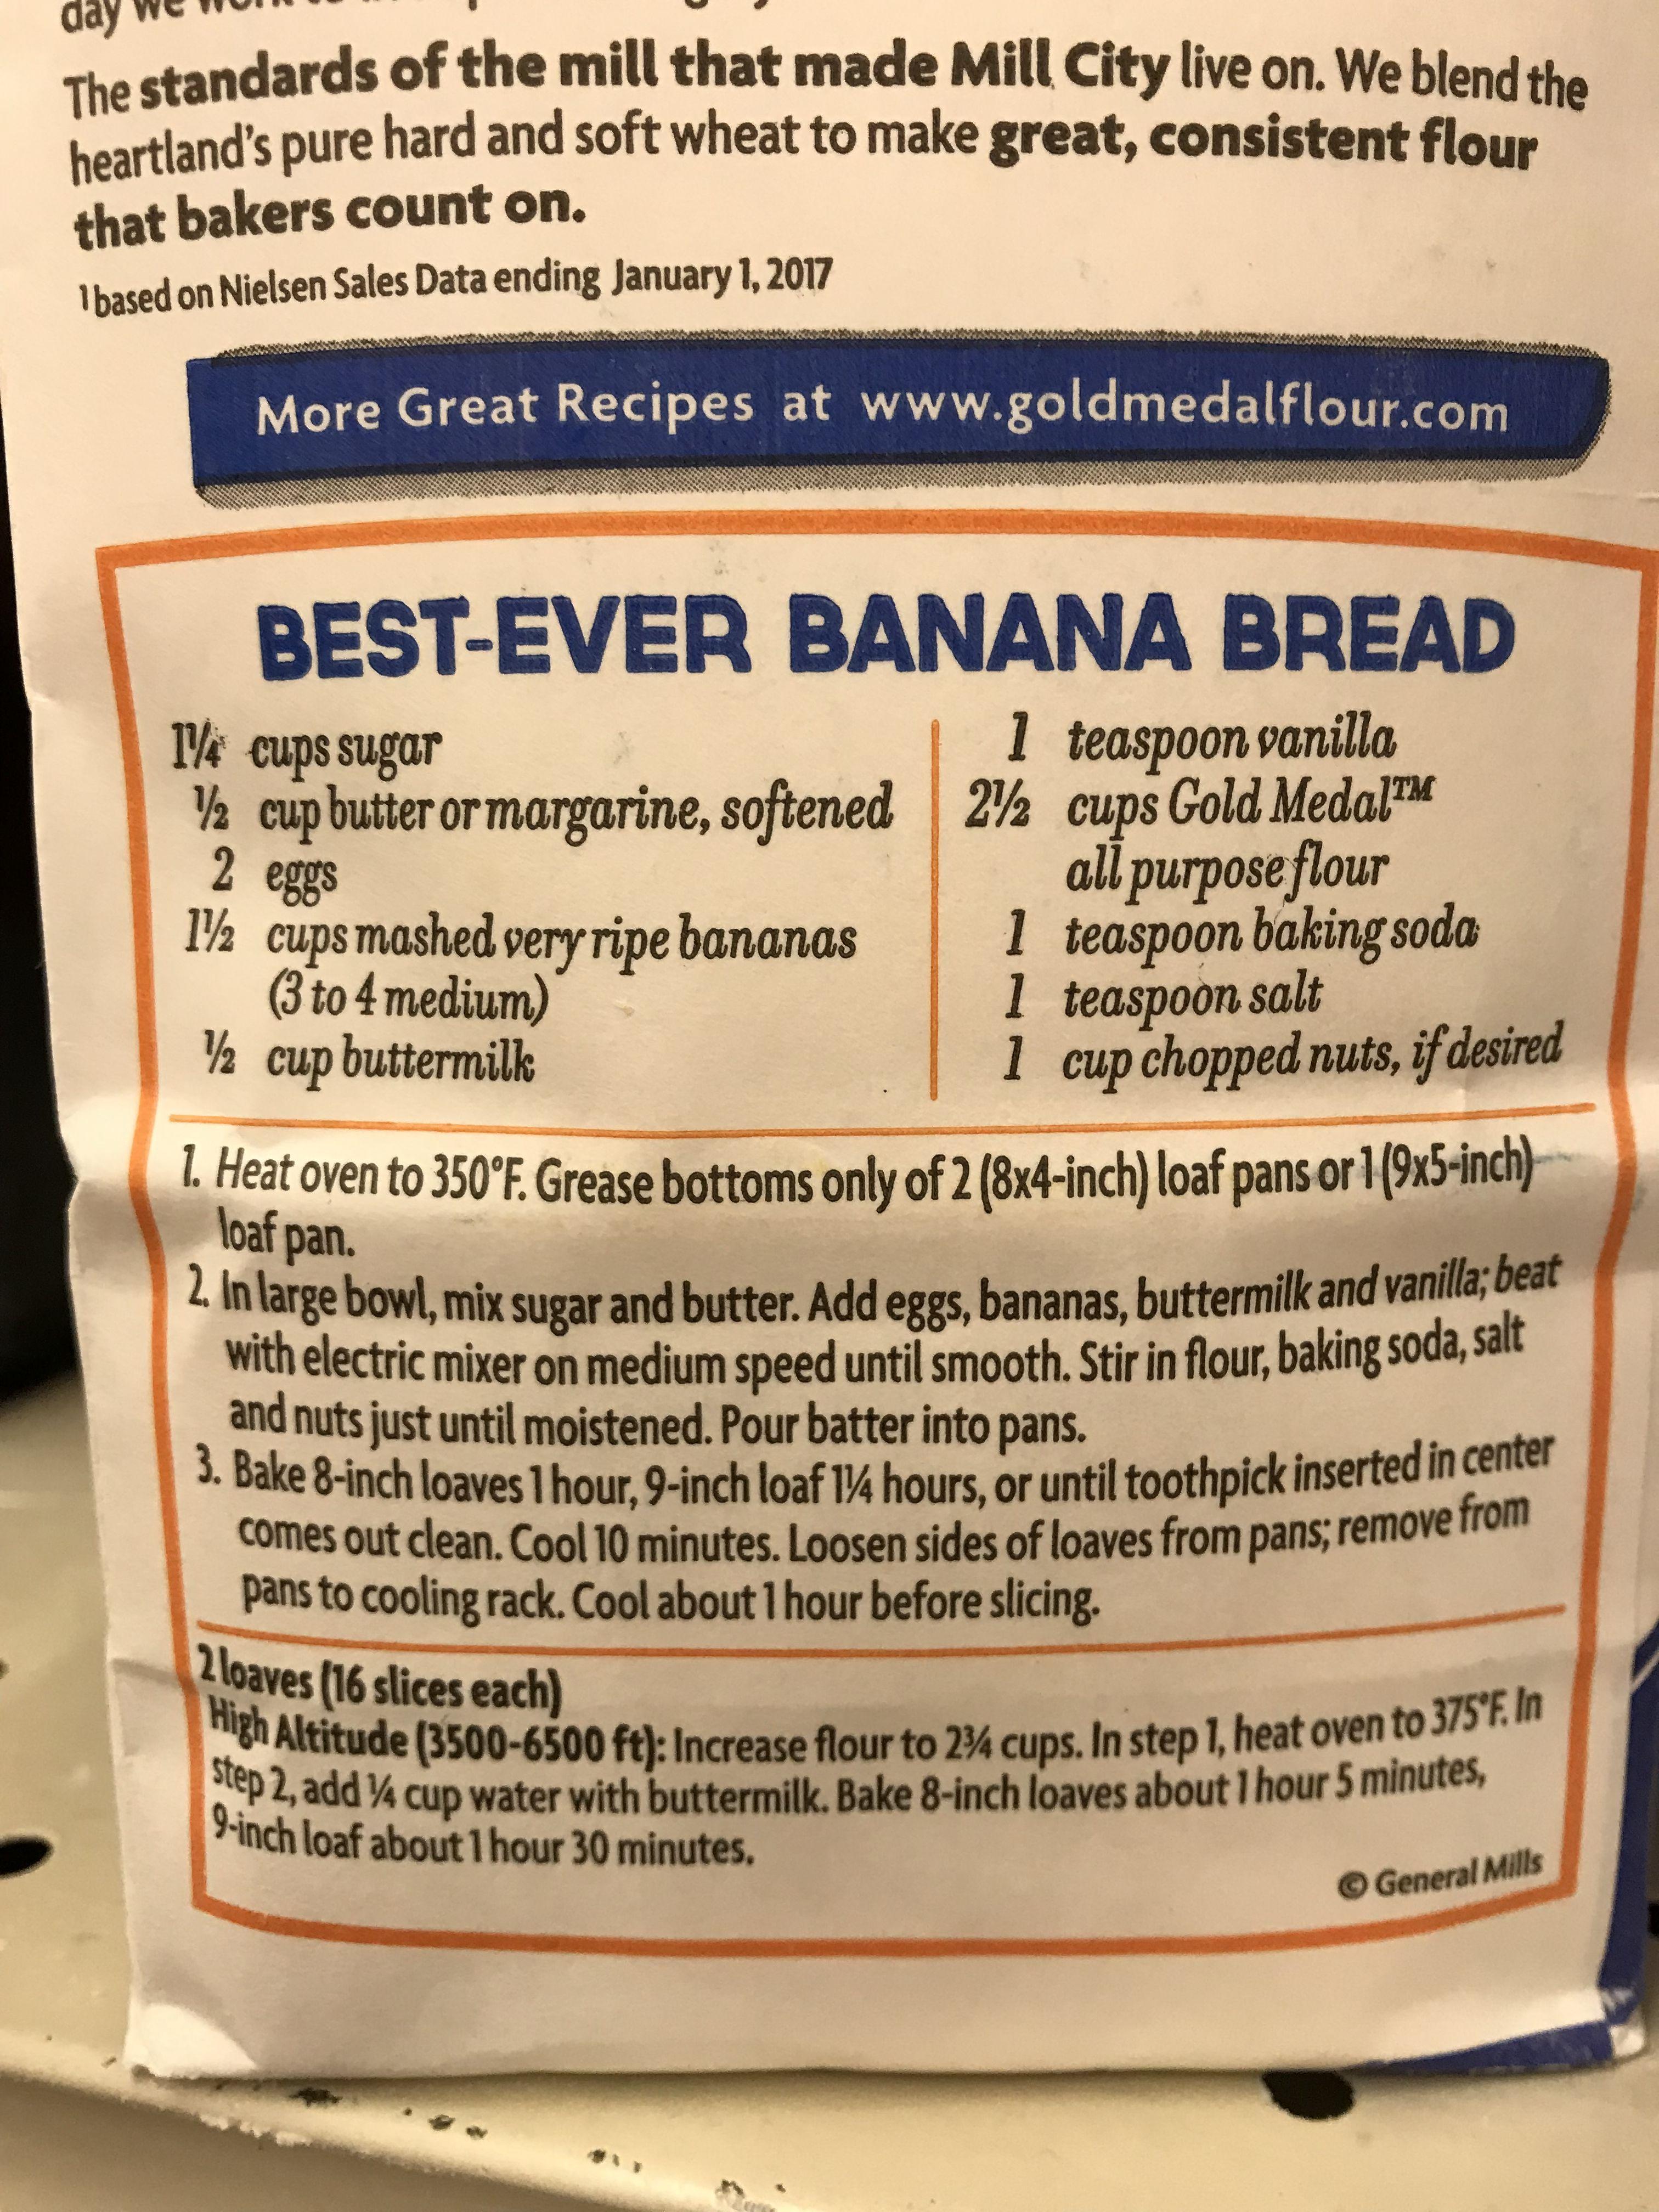 Gold Medal Flour S Best Ever Banana Bread Bread Packaging Flours Banana Bread Gold Medal Banana Bread Recipe